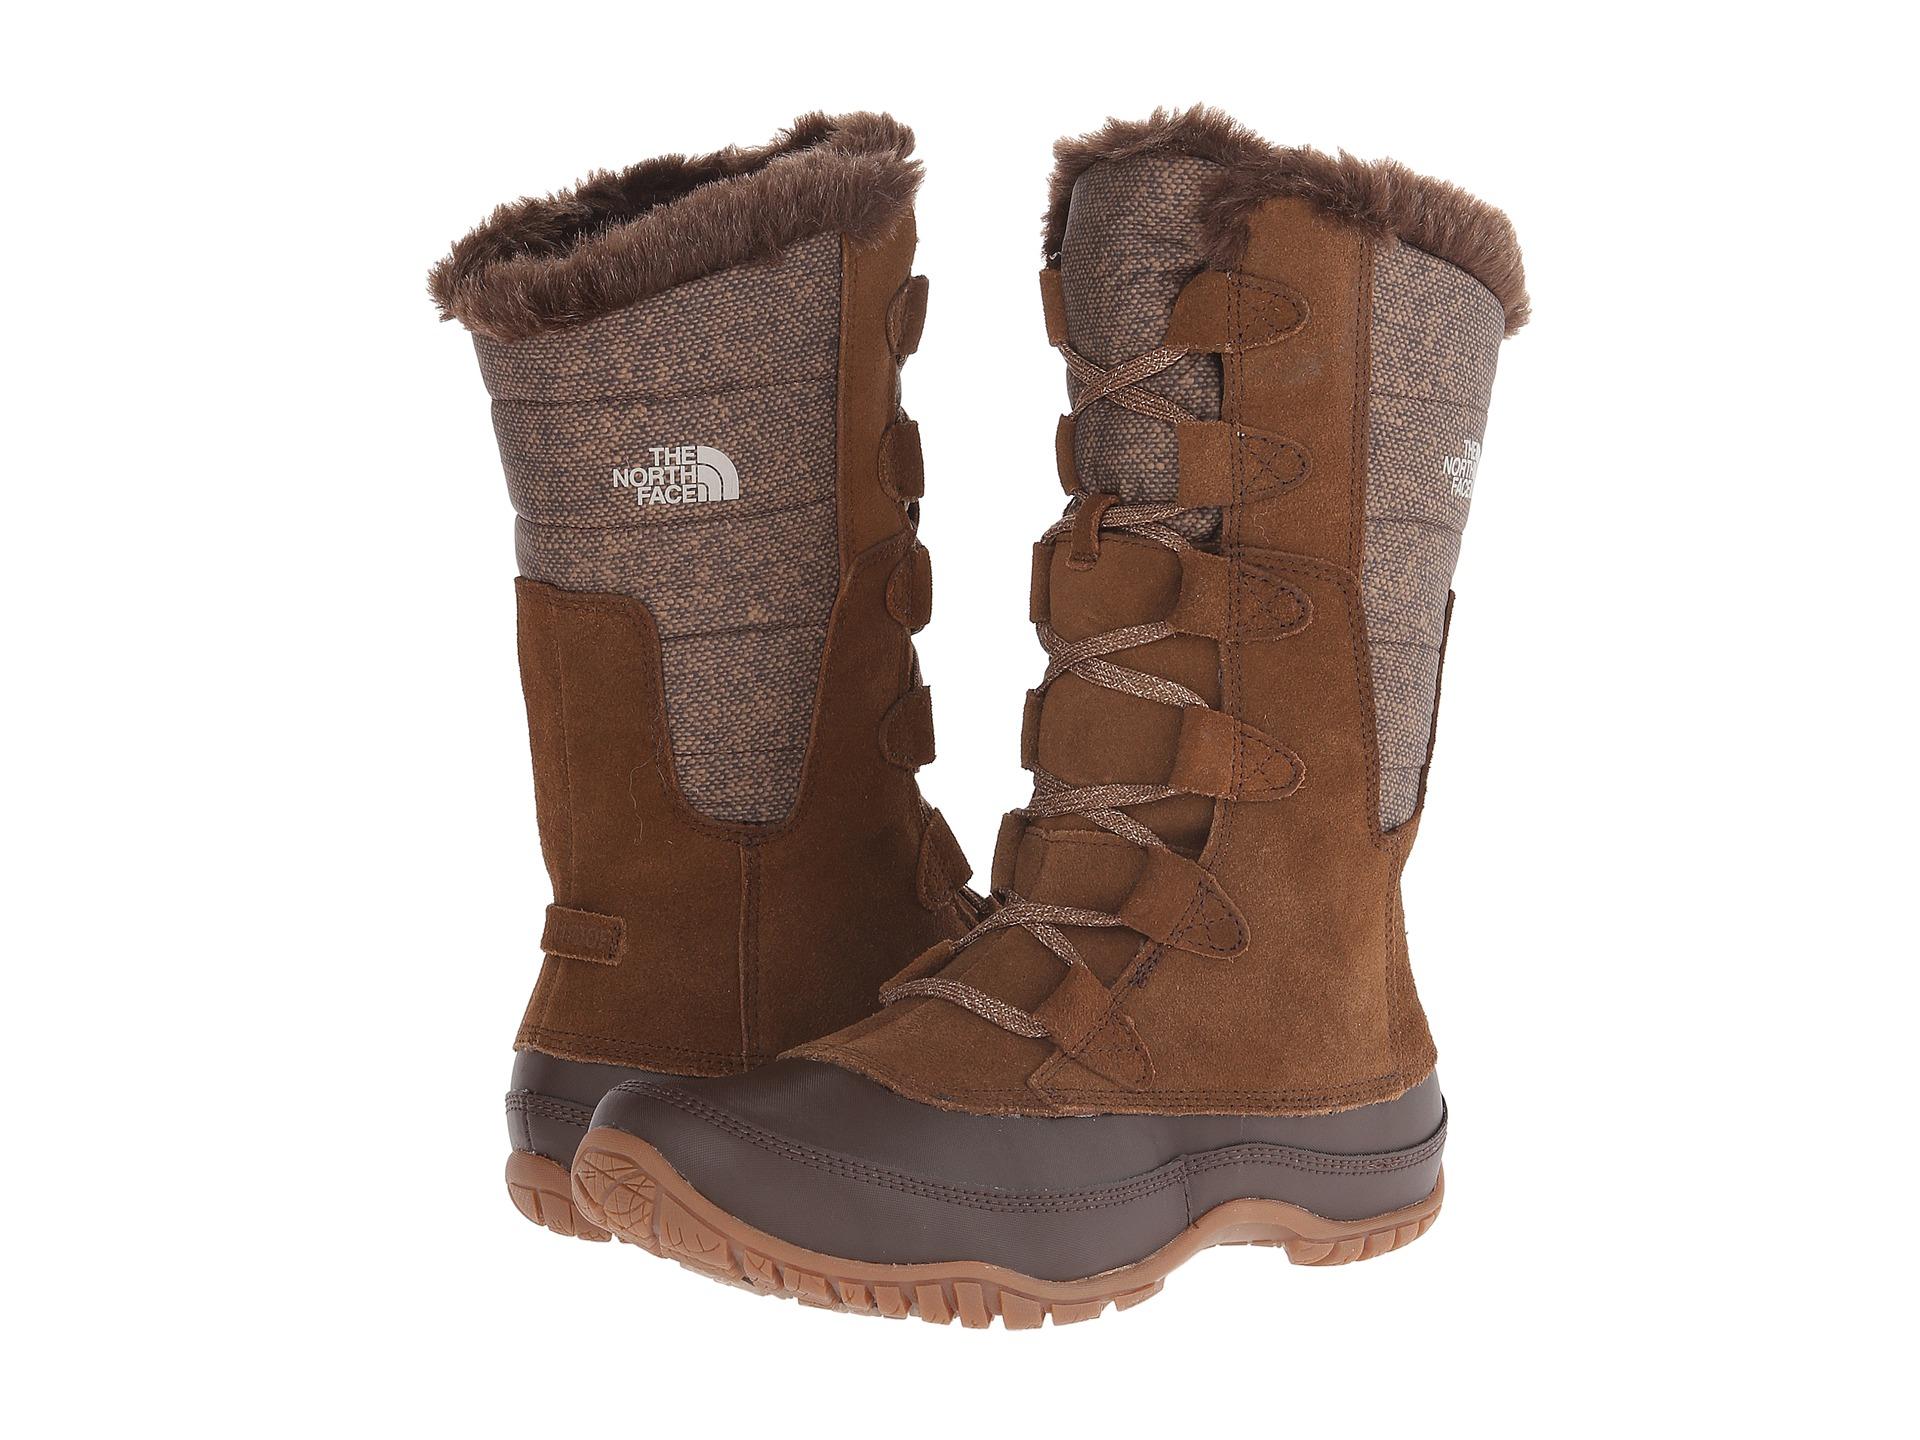 north face women;s nuptse purna shiny winter boots